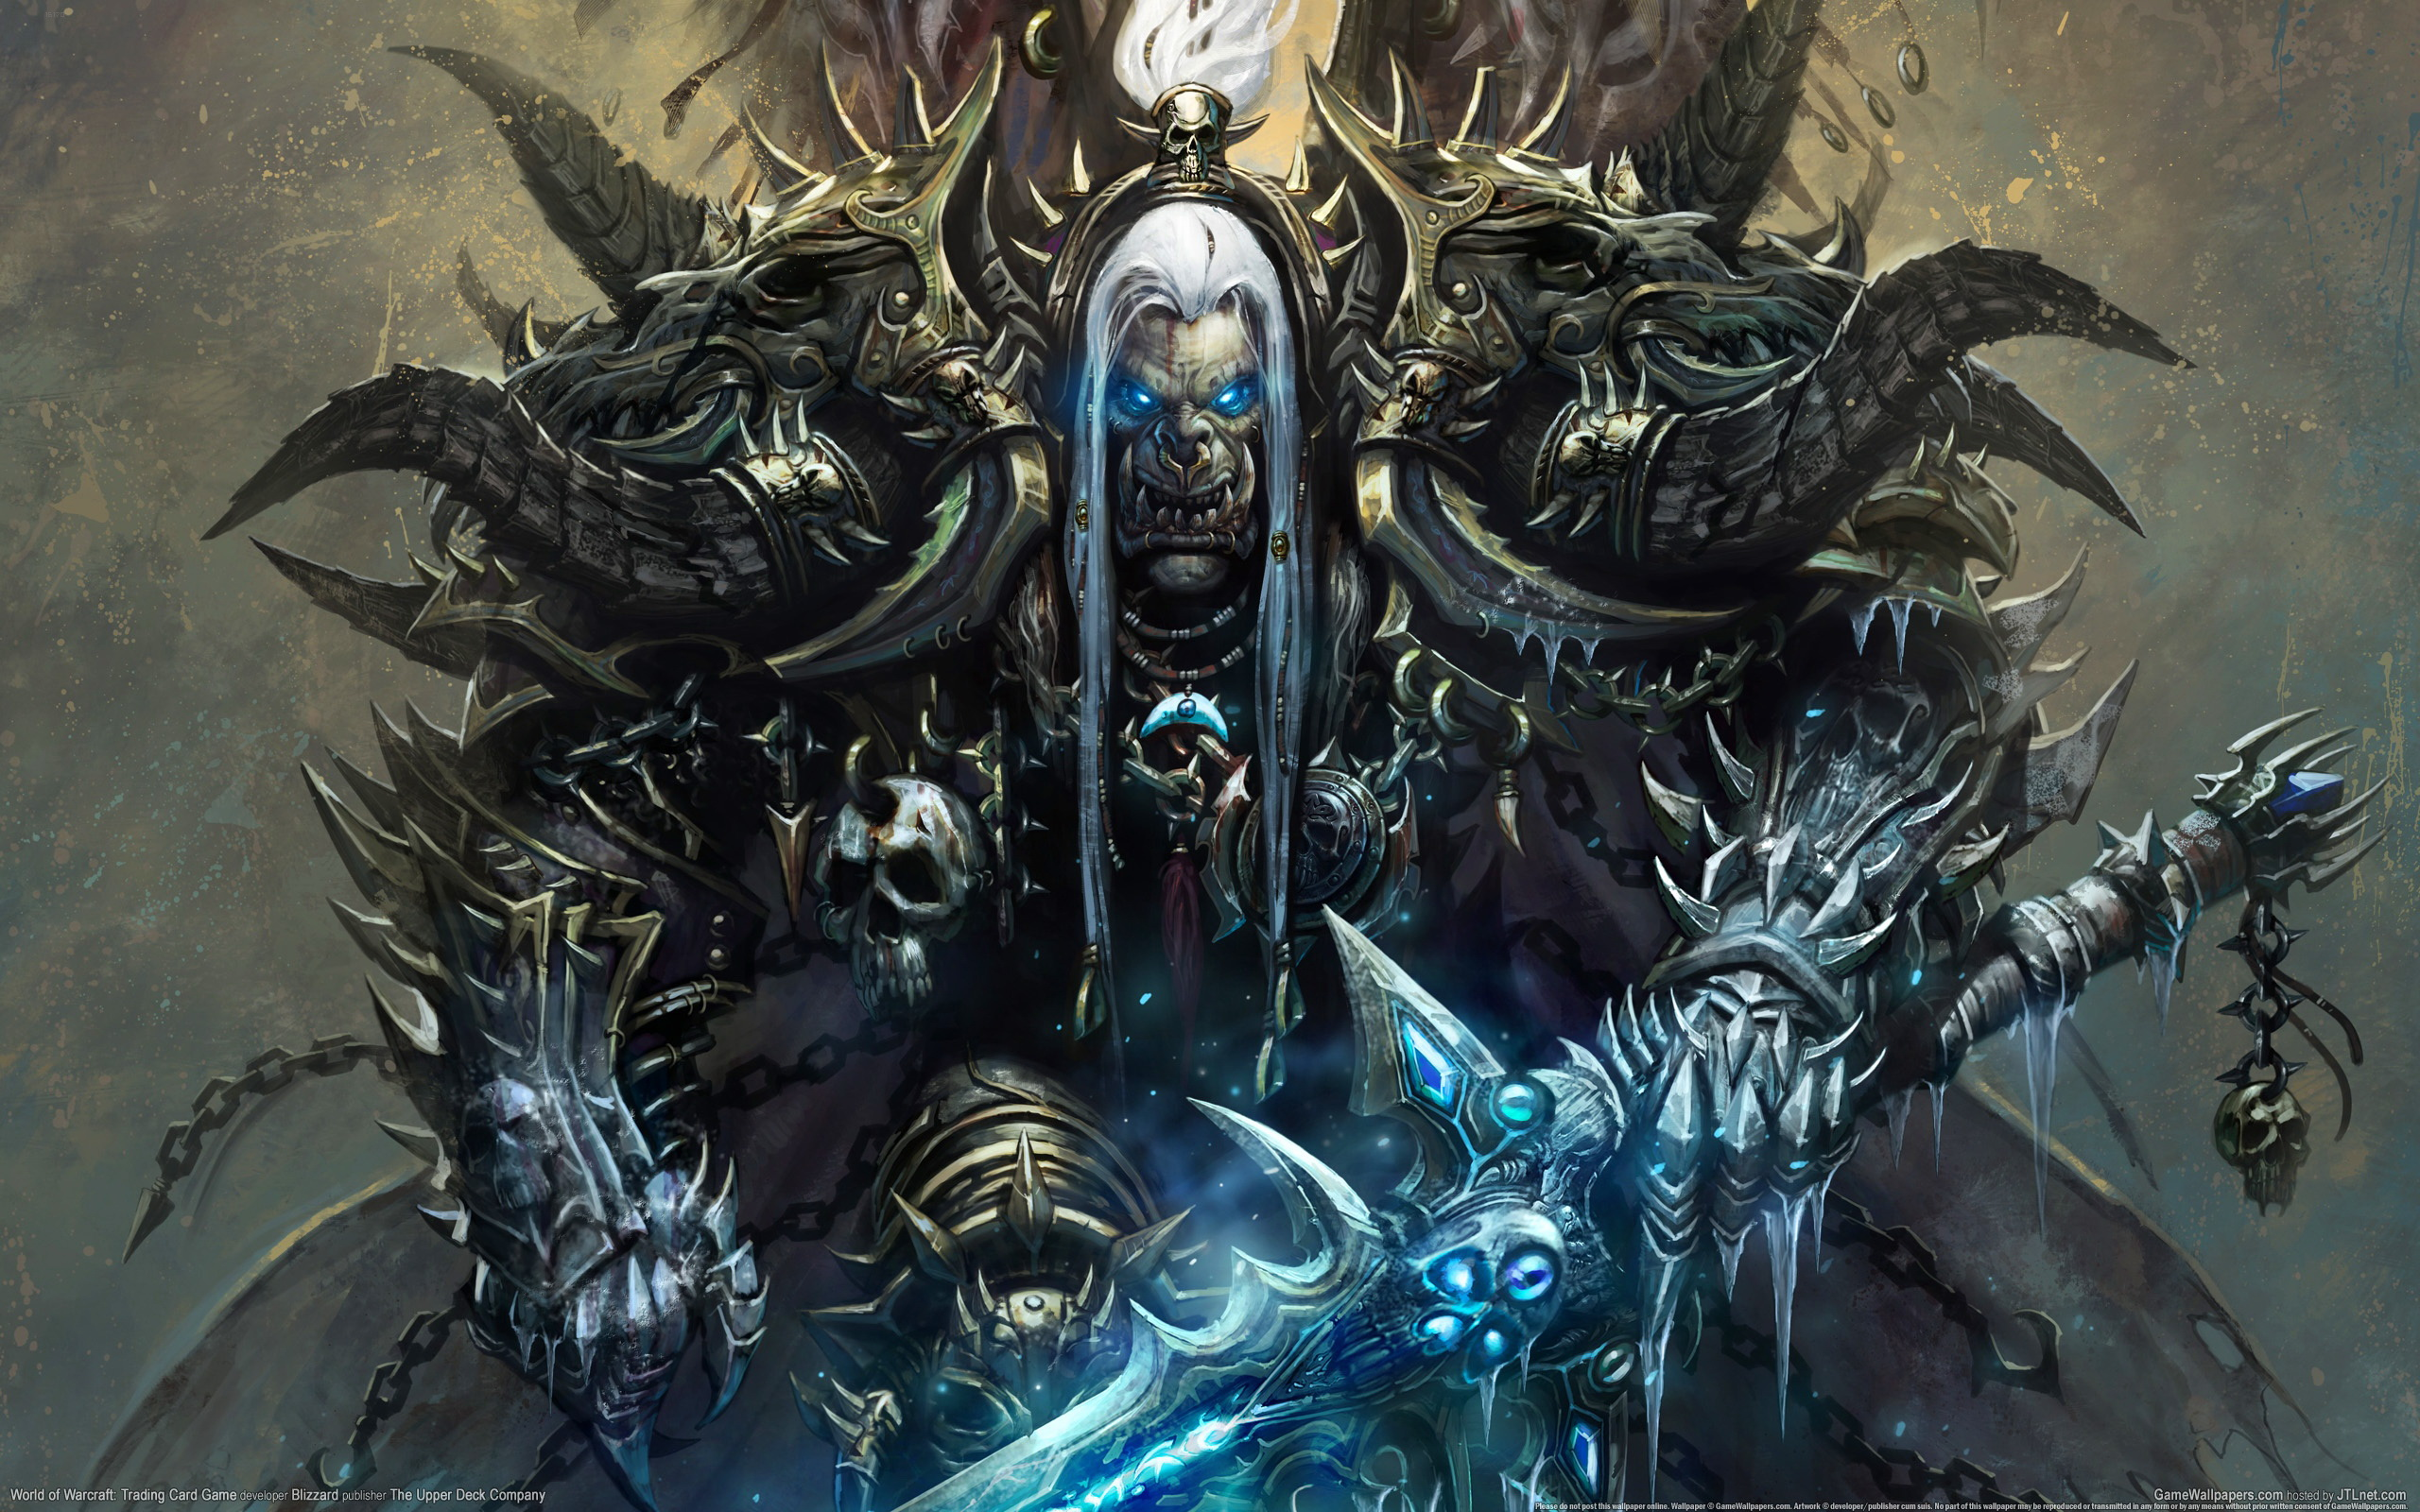 892 world of warcraft fonds d 39 cran hd arri re plans - Fantasy wallpaper 720p ...